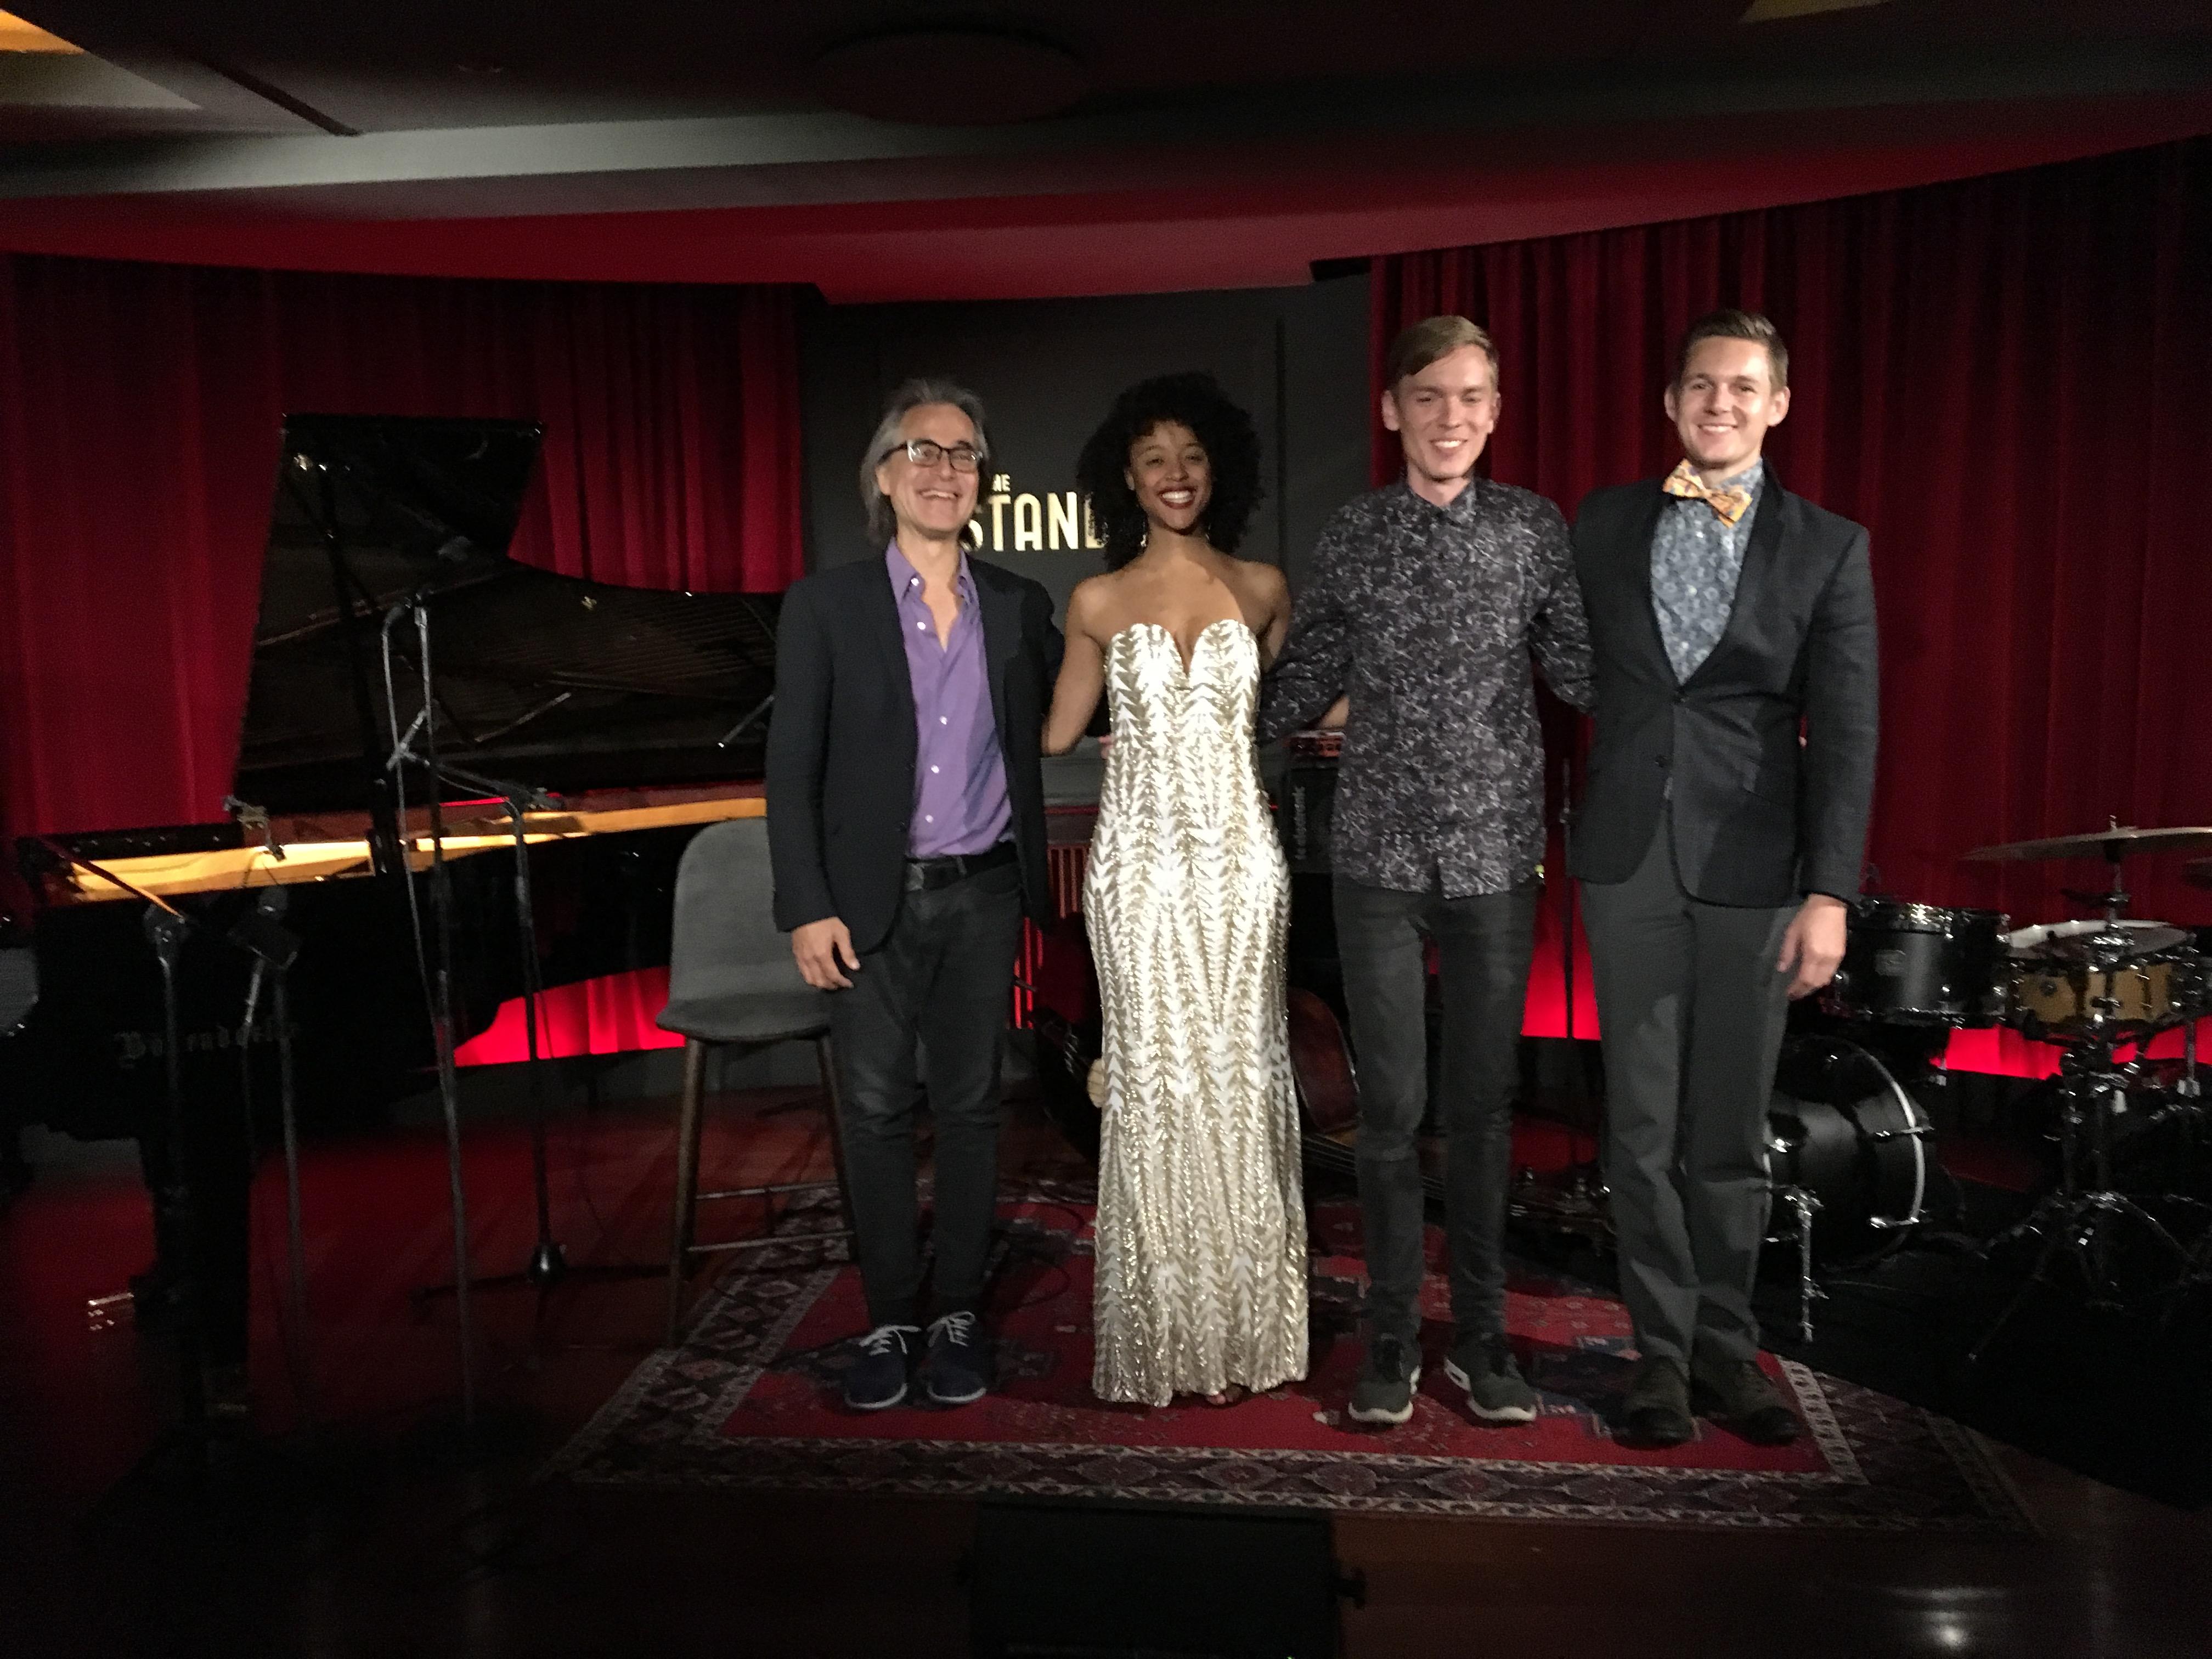 Niels Lan Doky, Jordan Jackson, Tobias Dall og Niclas Bardeleben på The Standard Jazz Club - pressefoto, 2016